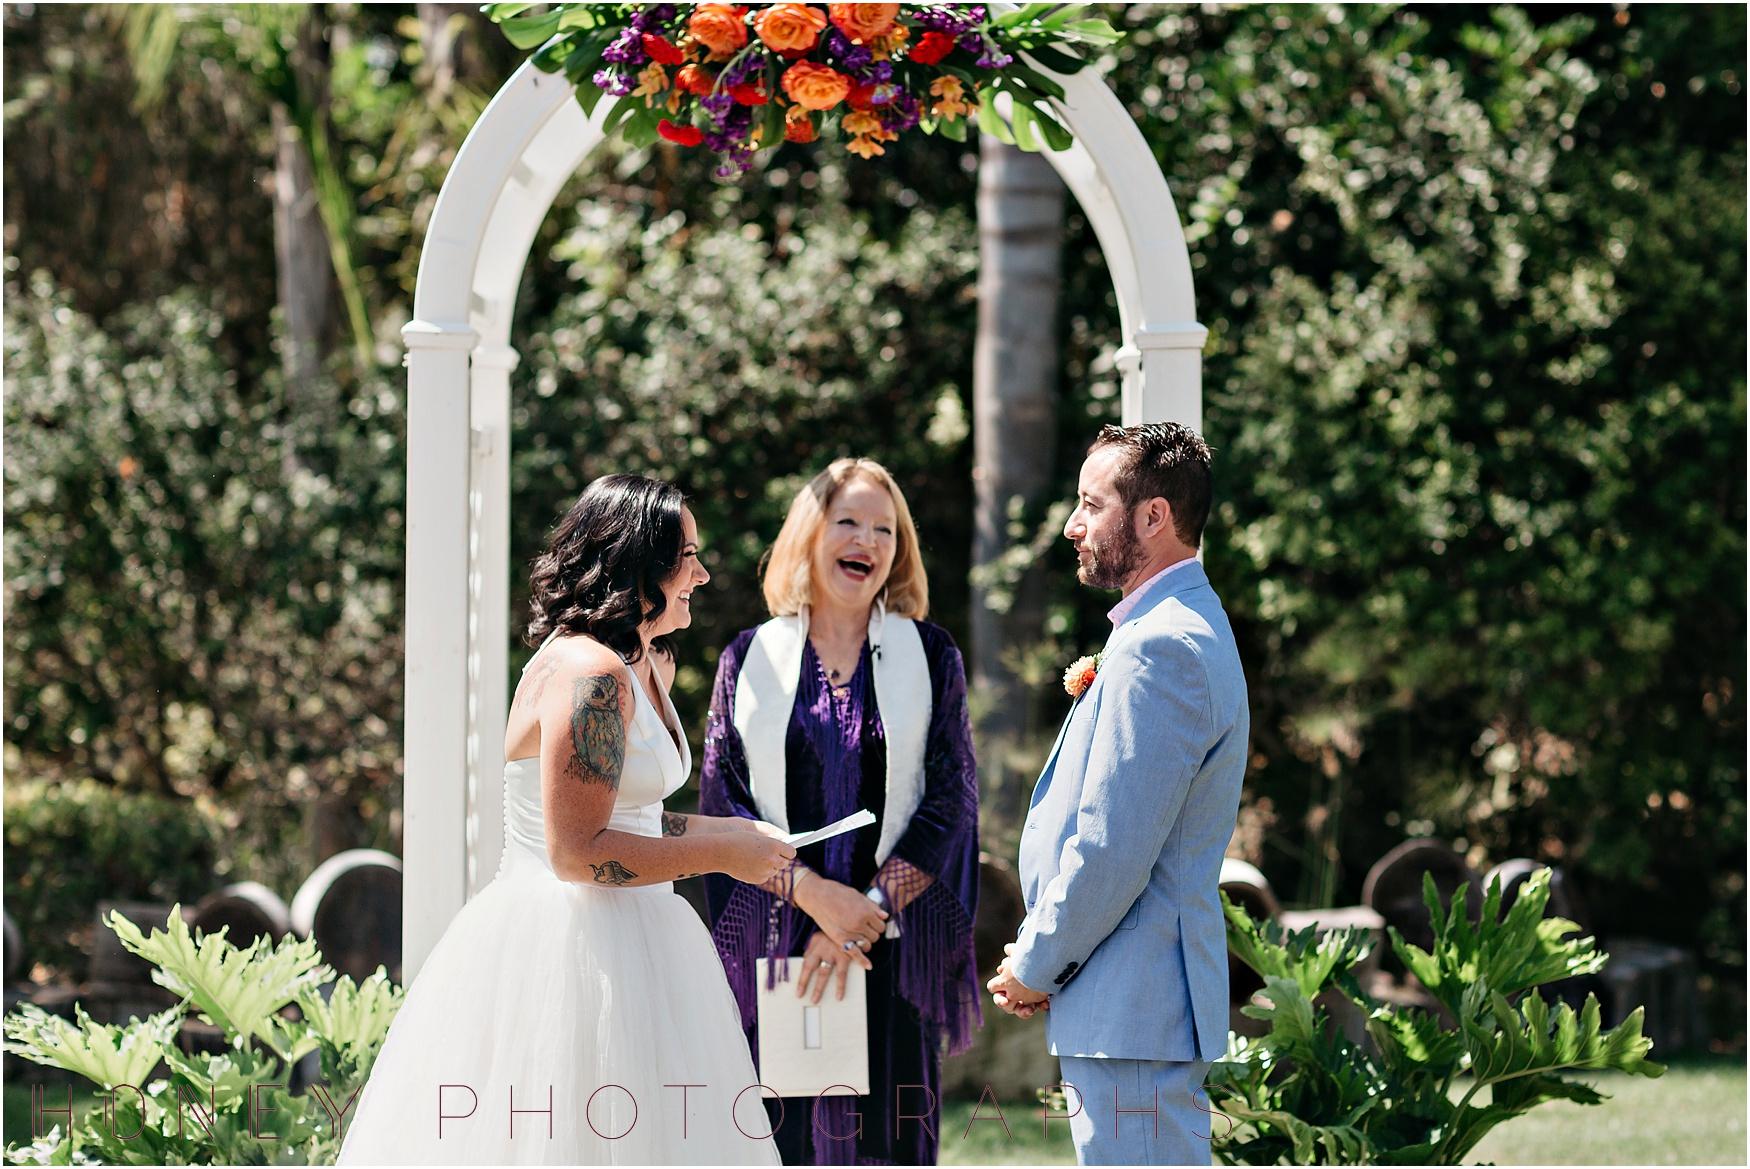 colorful_ecclectic_vibrant_vista_rainbow_quirky_wedding019.jpg